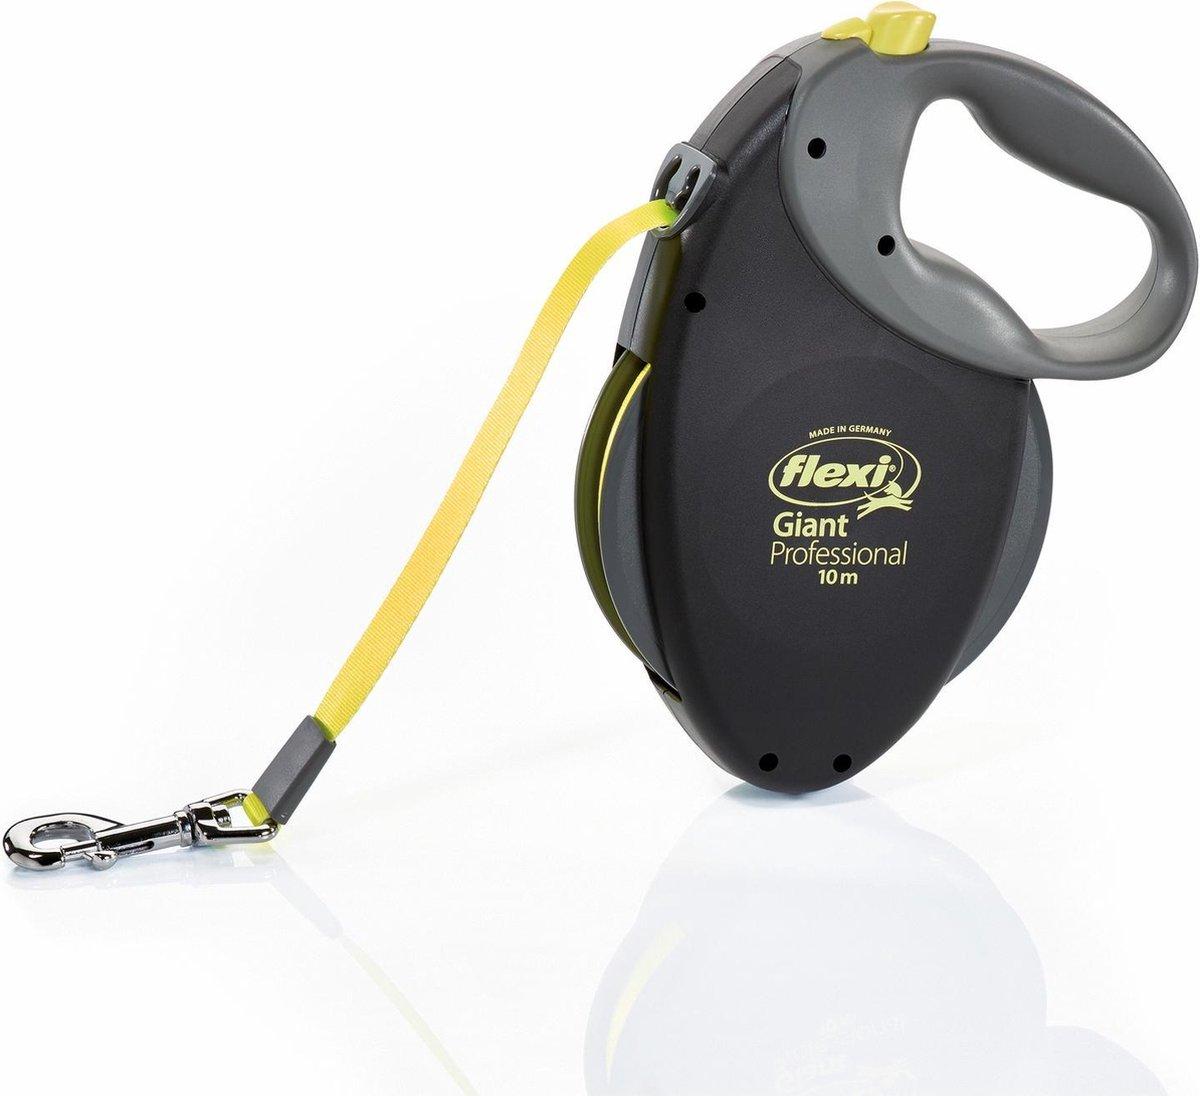 Flexi Giant Tape - Hondenriem - Zwart/Geel - L - 10 m - (<50 kg) - Flexi